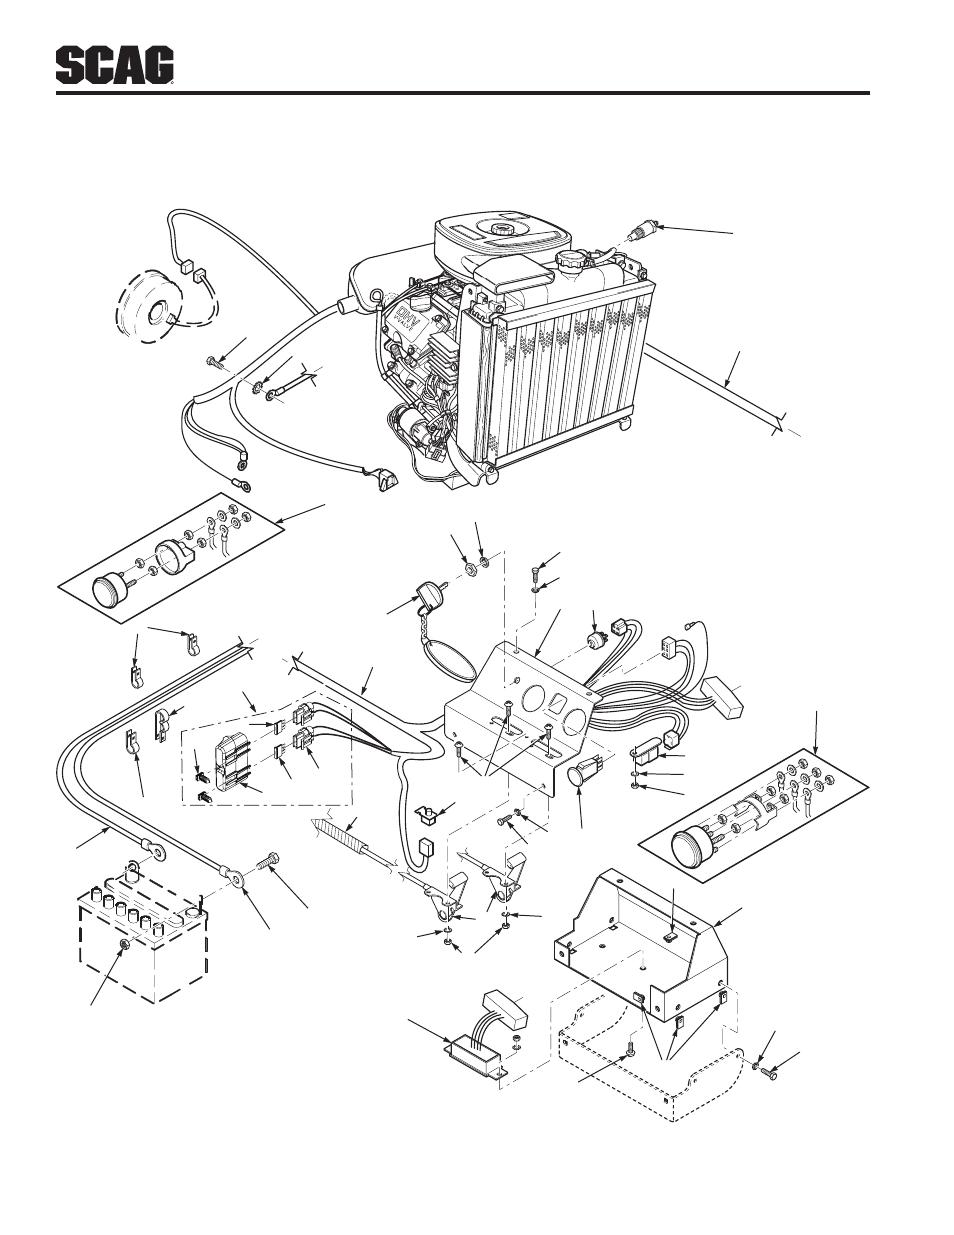 Kawasaki Scag Turf Tiger Wiring Diagram - Wiring Diagrams Place